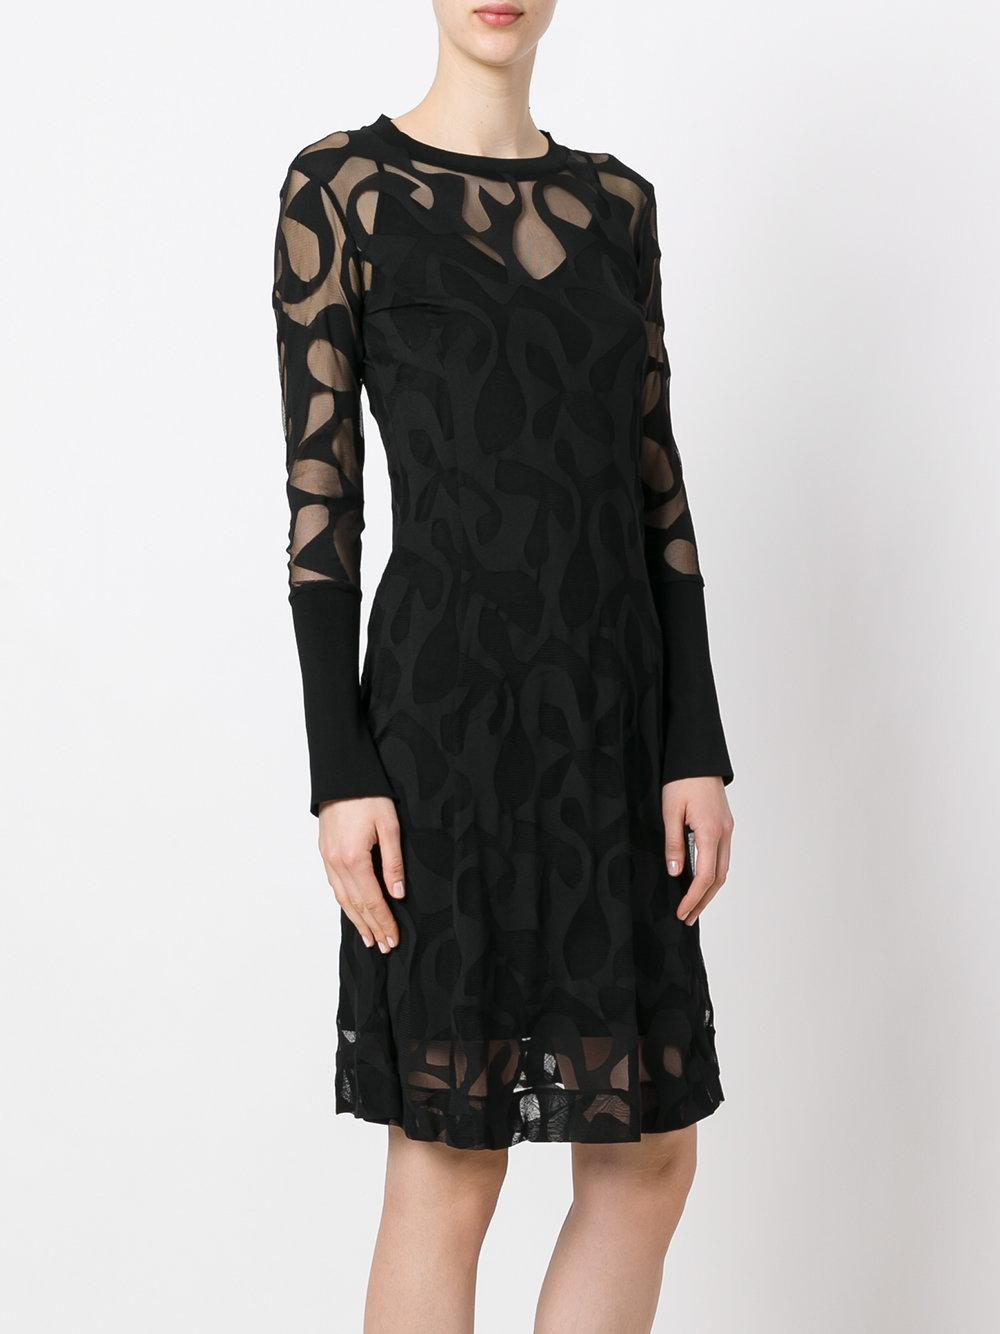 Malene Birger Axelremsväska : Lyst by malene birger punaa dress in black